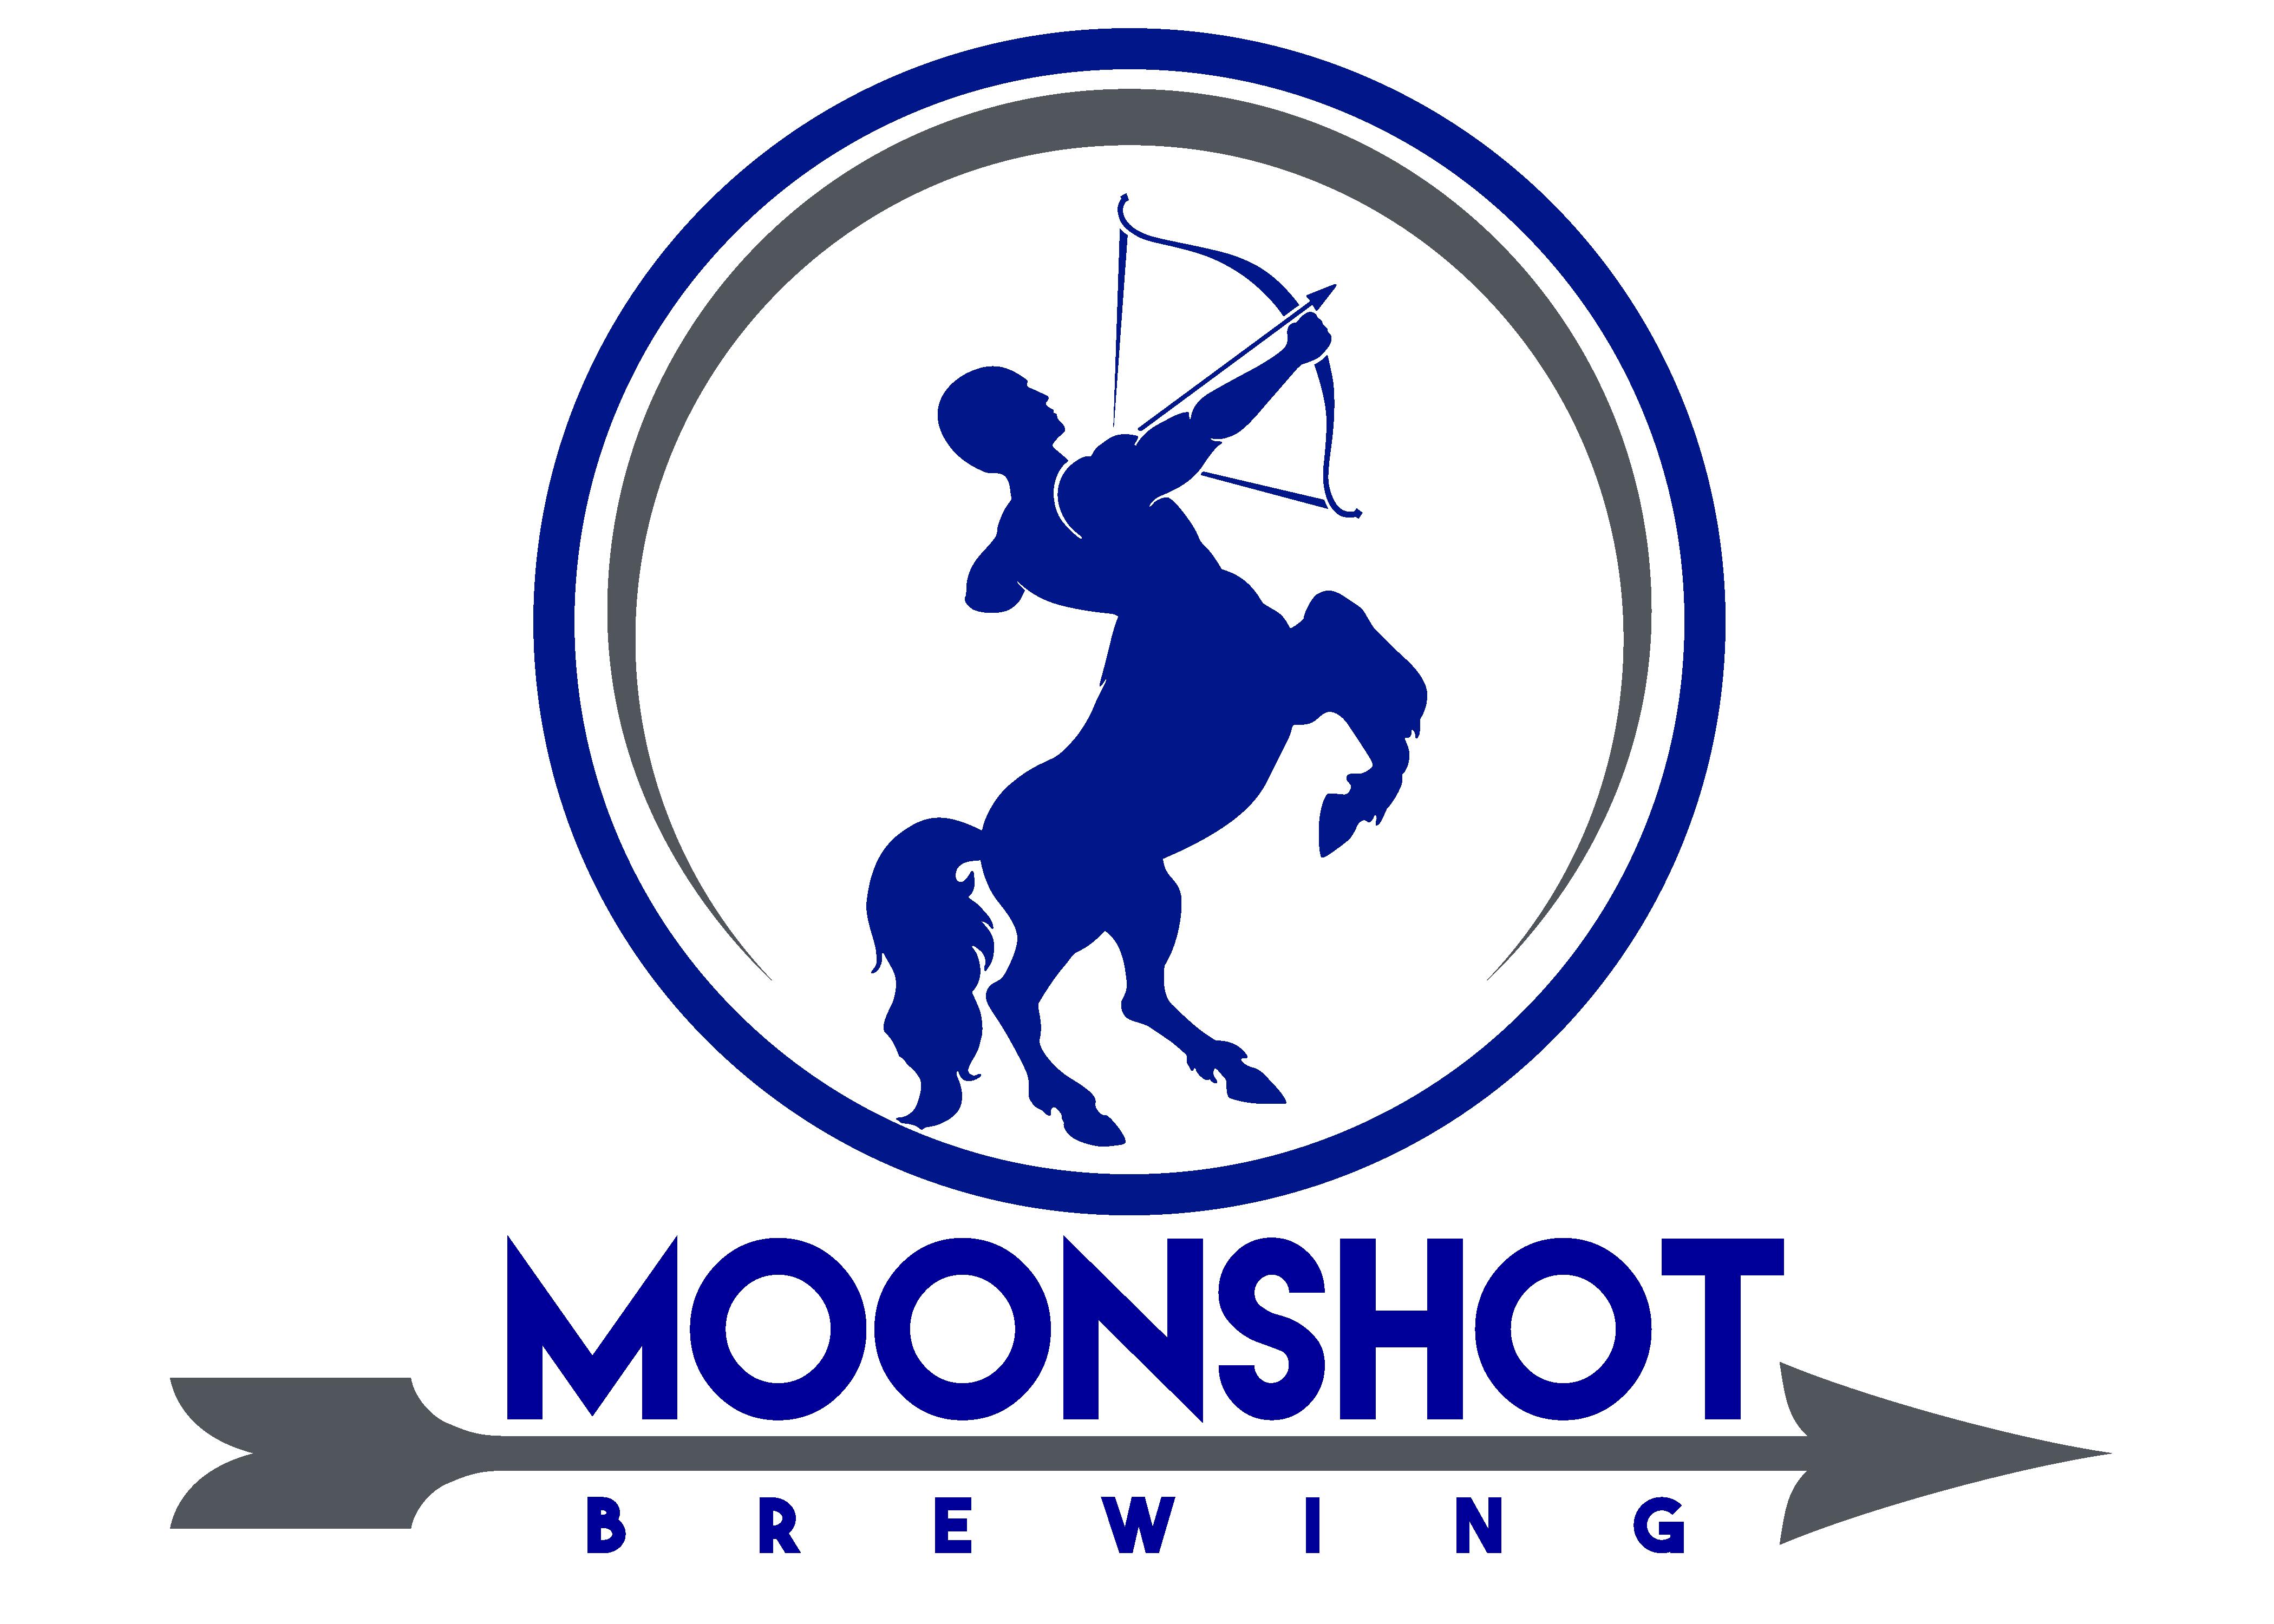 Moonshot Brewing Altbier